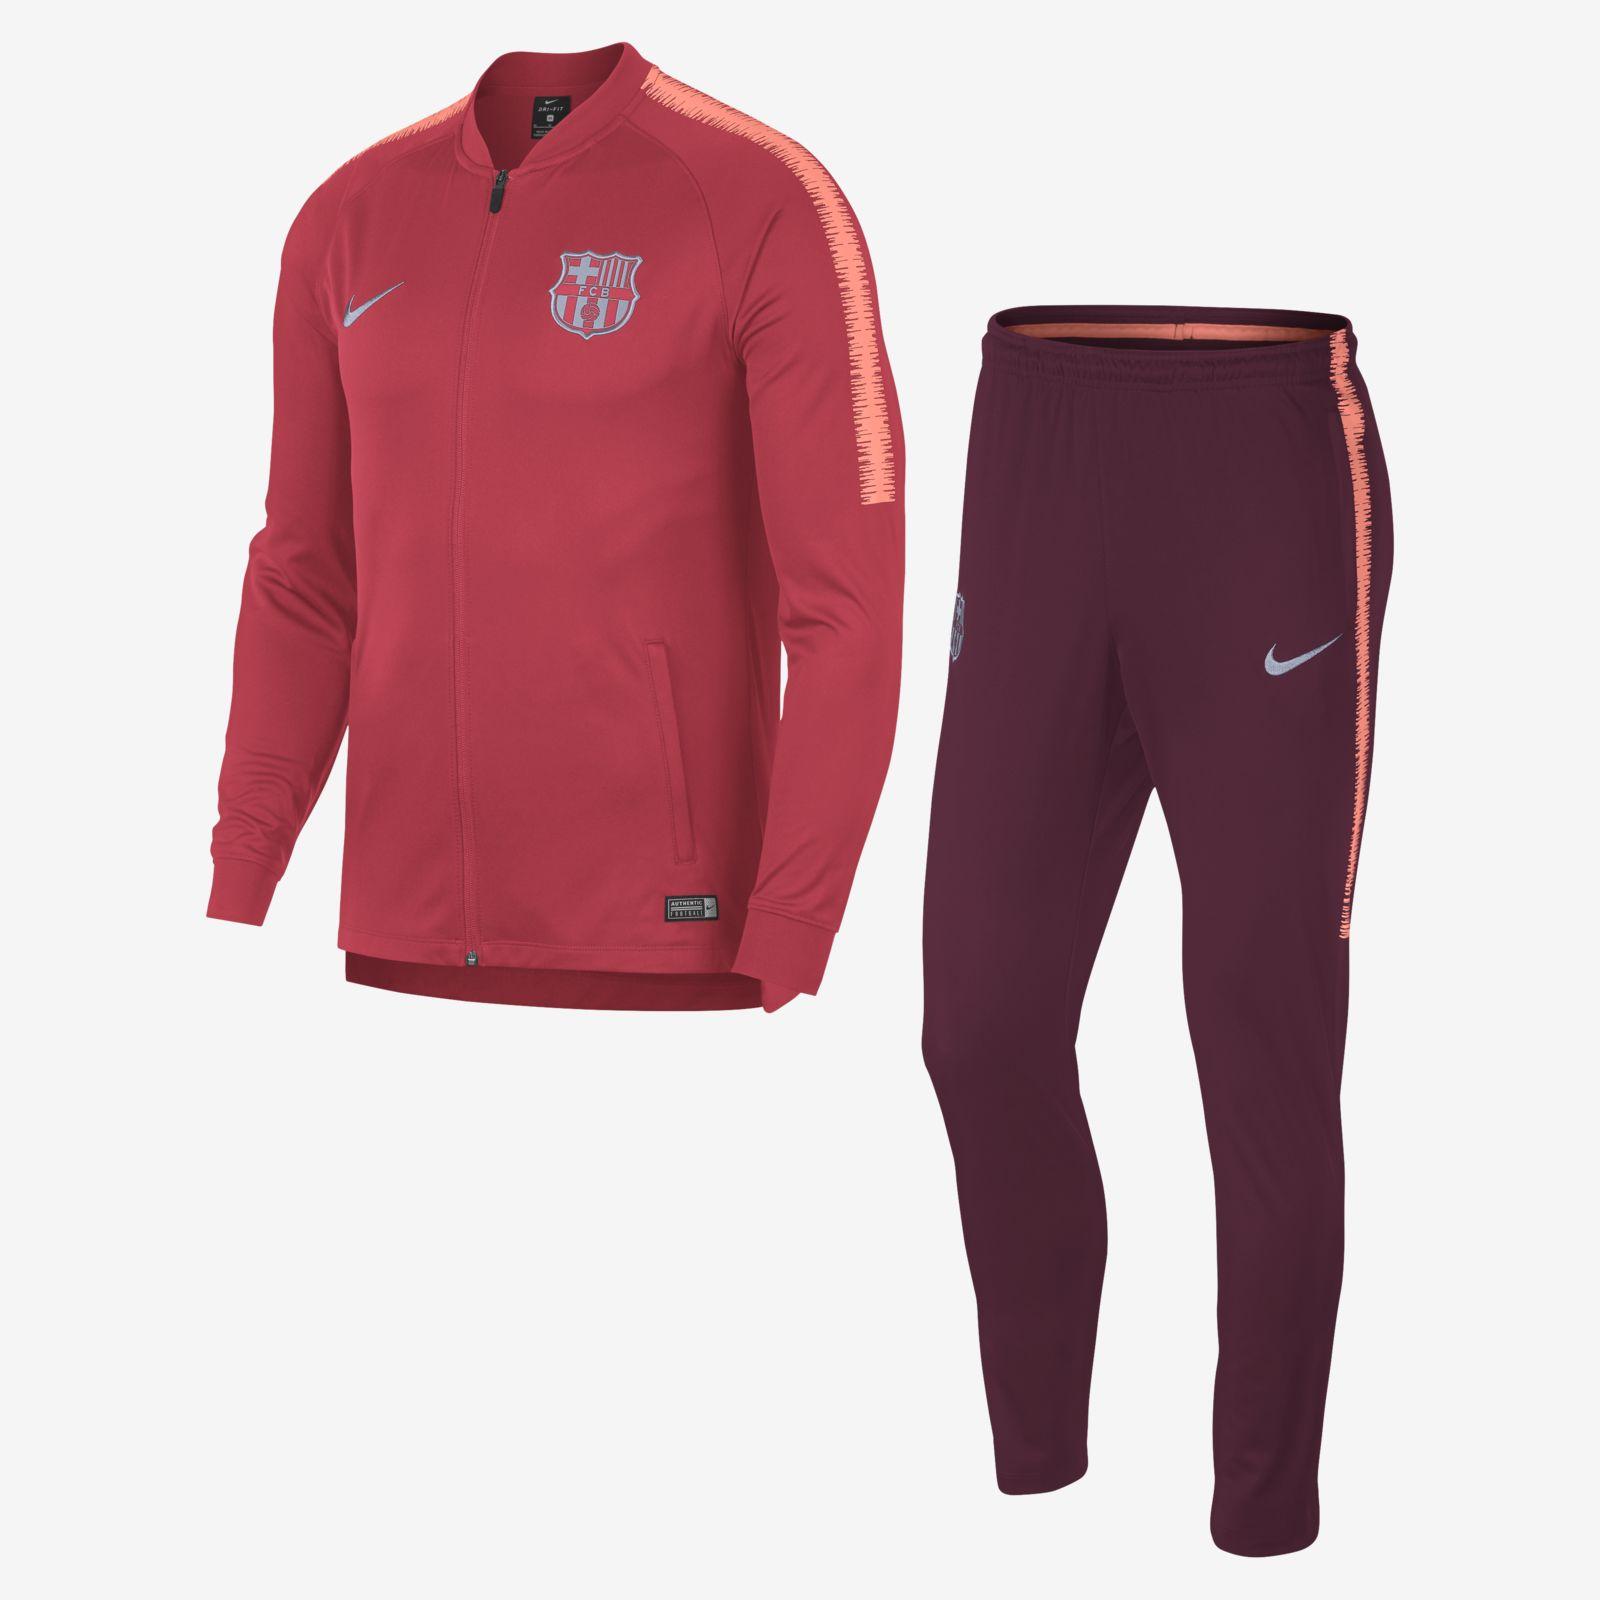 on sale 4725a 0e4d8 Nike FC Barcelona 2018 19 Dri-FIT Squad Football Track Suit (Size M) - Soccer  Shop Barcelona FC Merchandise - Superfanas.lt